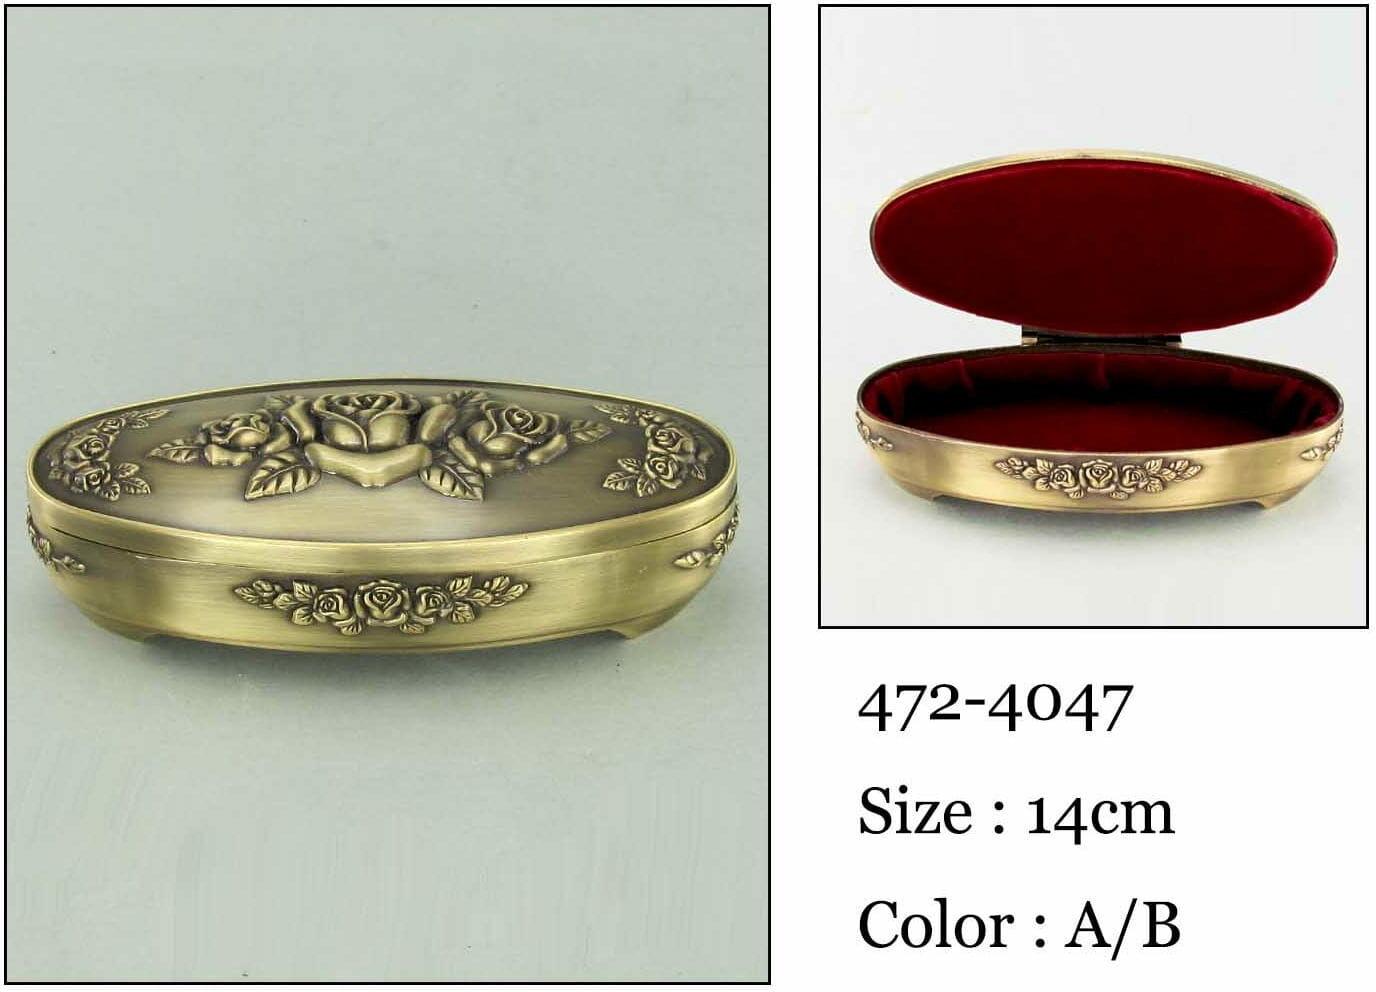 Kasetka, stare złoto, 13,5x6 cm